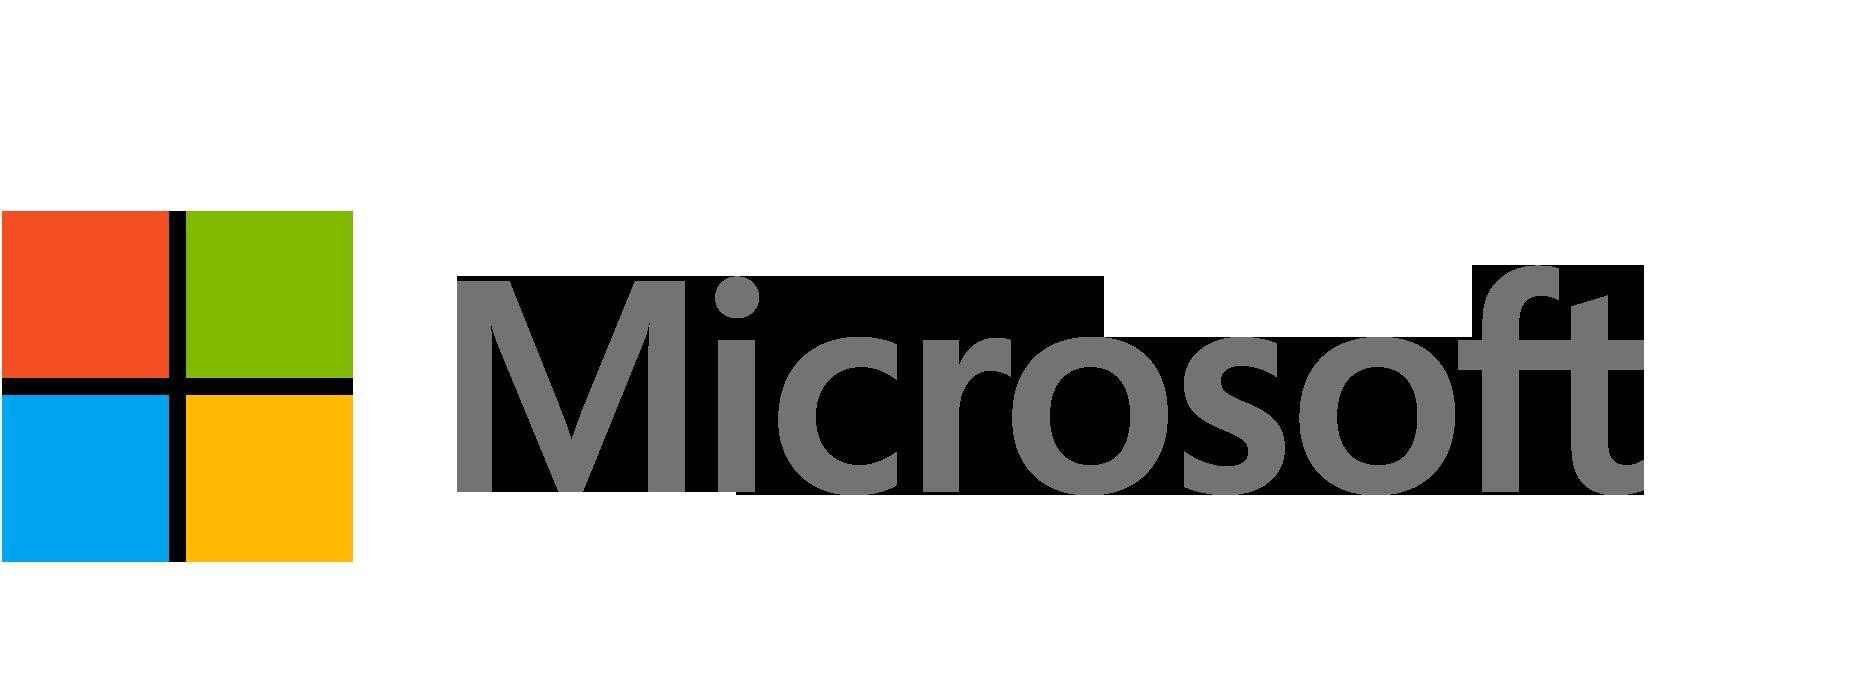 Microsoft Windows 10 Home (KW9-00265)